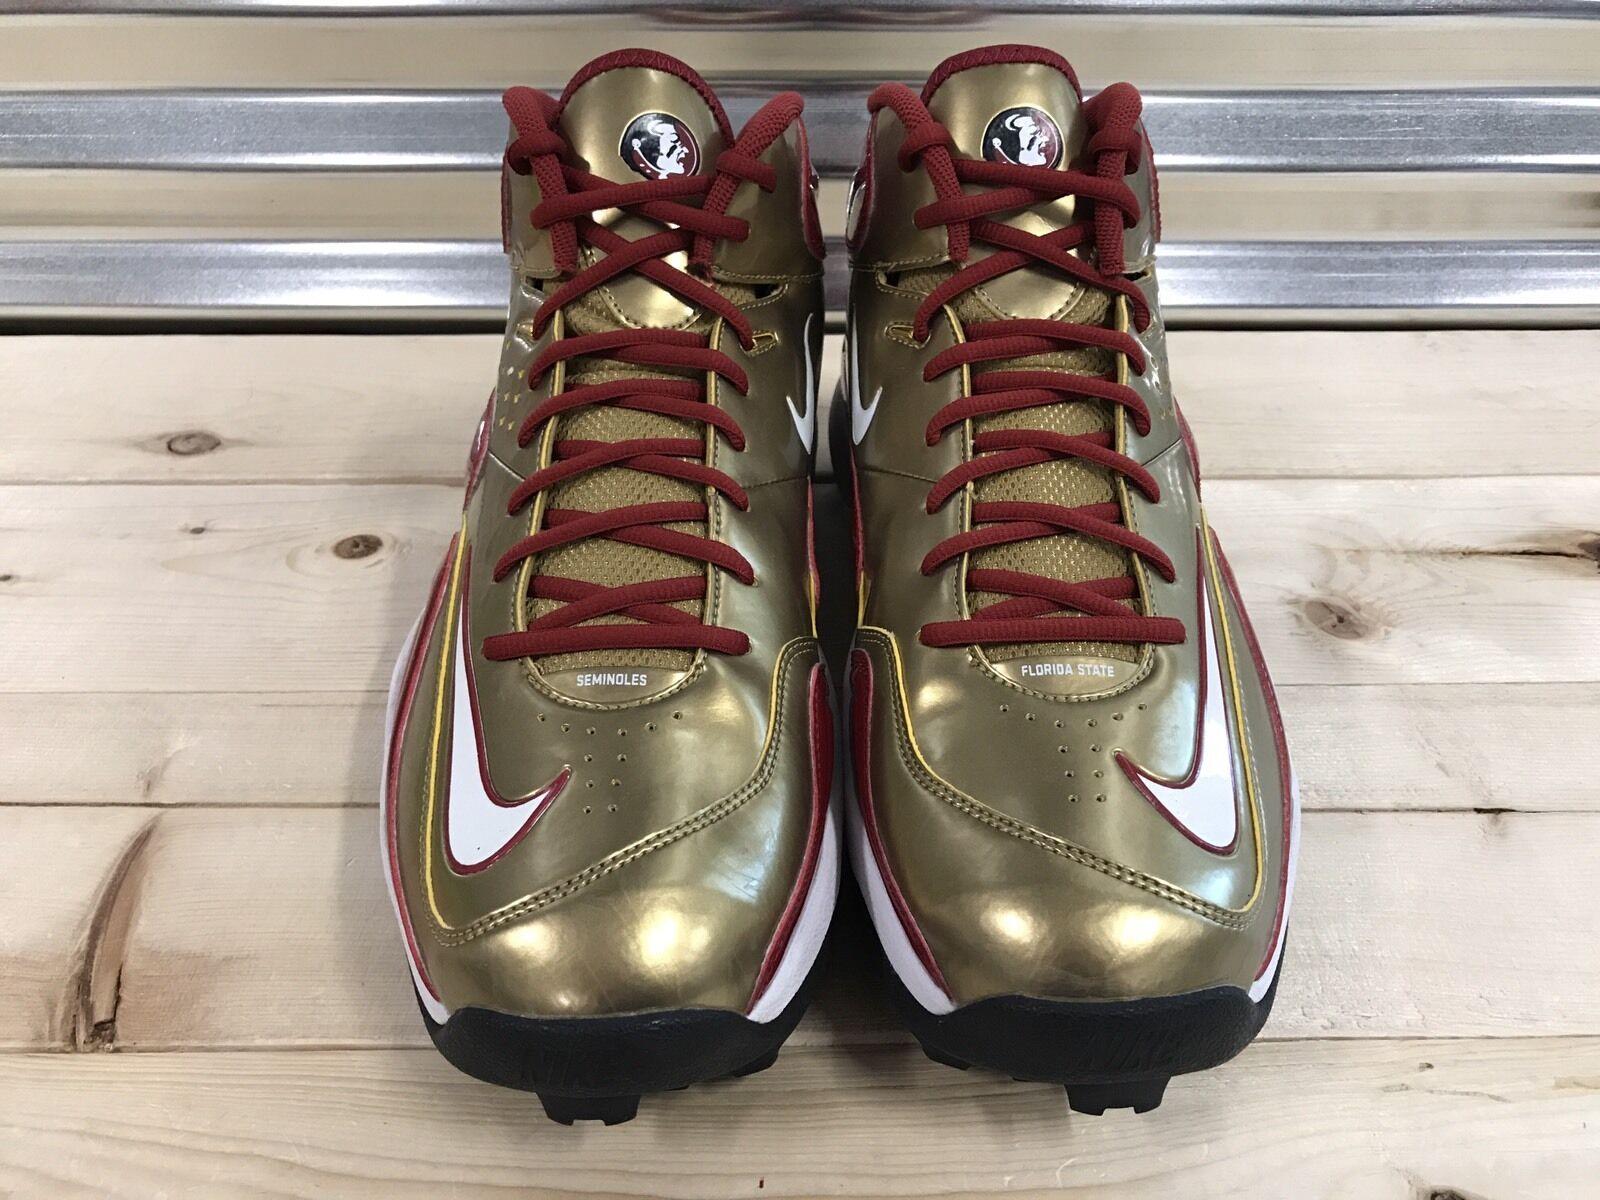 Nike Zoom Merciless Pro Football Cleats Turfs Florida State Seminoles FSU  Sample 5af65c3ba